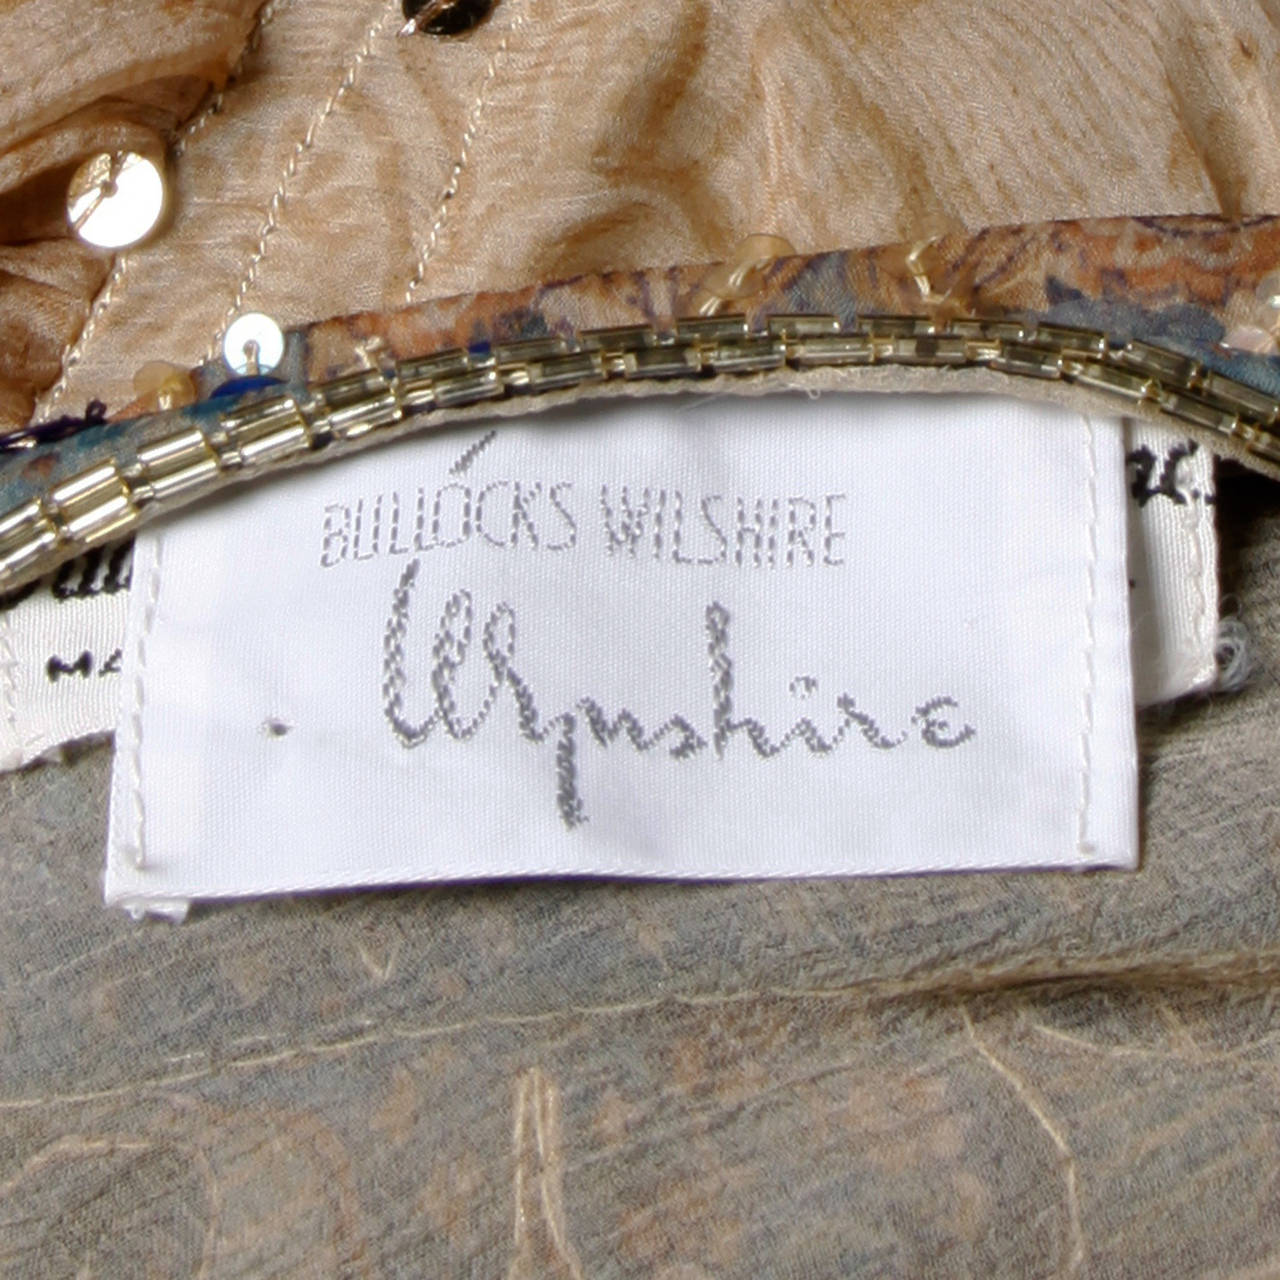 Judith Ann for Bullock's Wilshire Vintage 1970s Silk India Print Dress 10